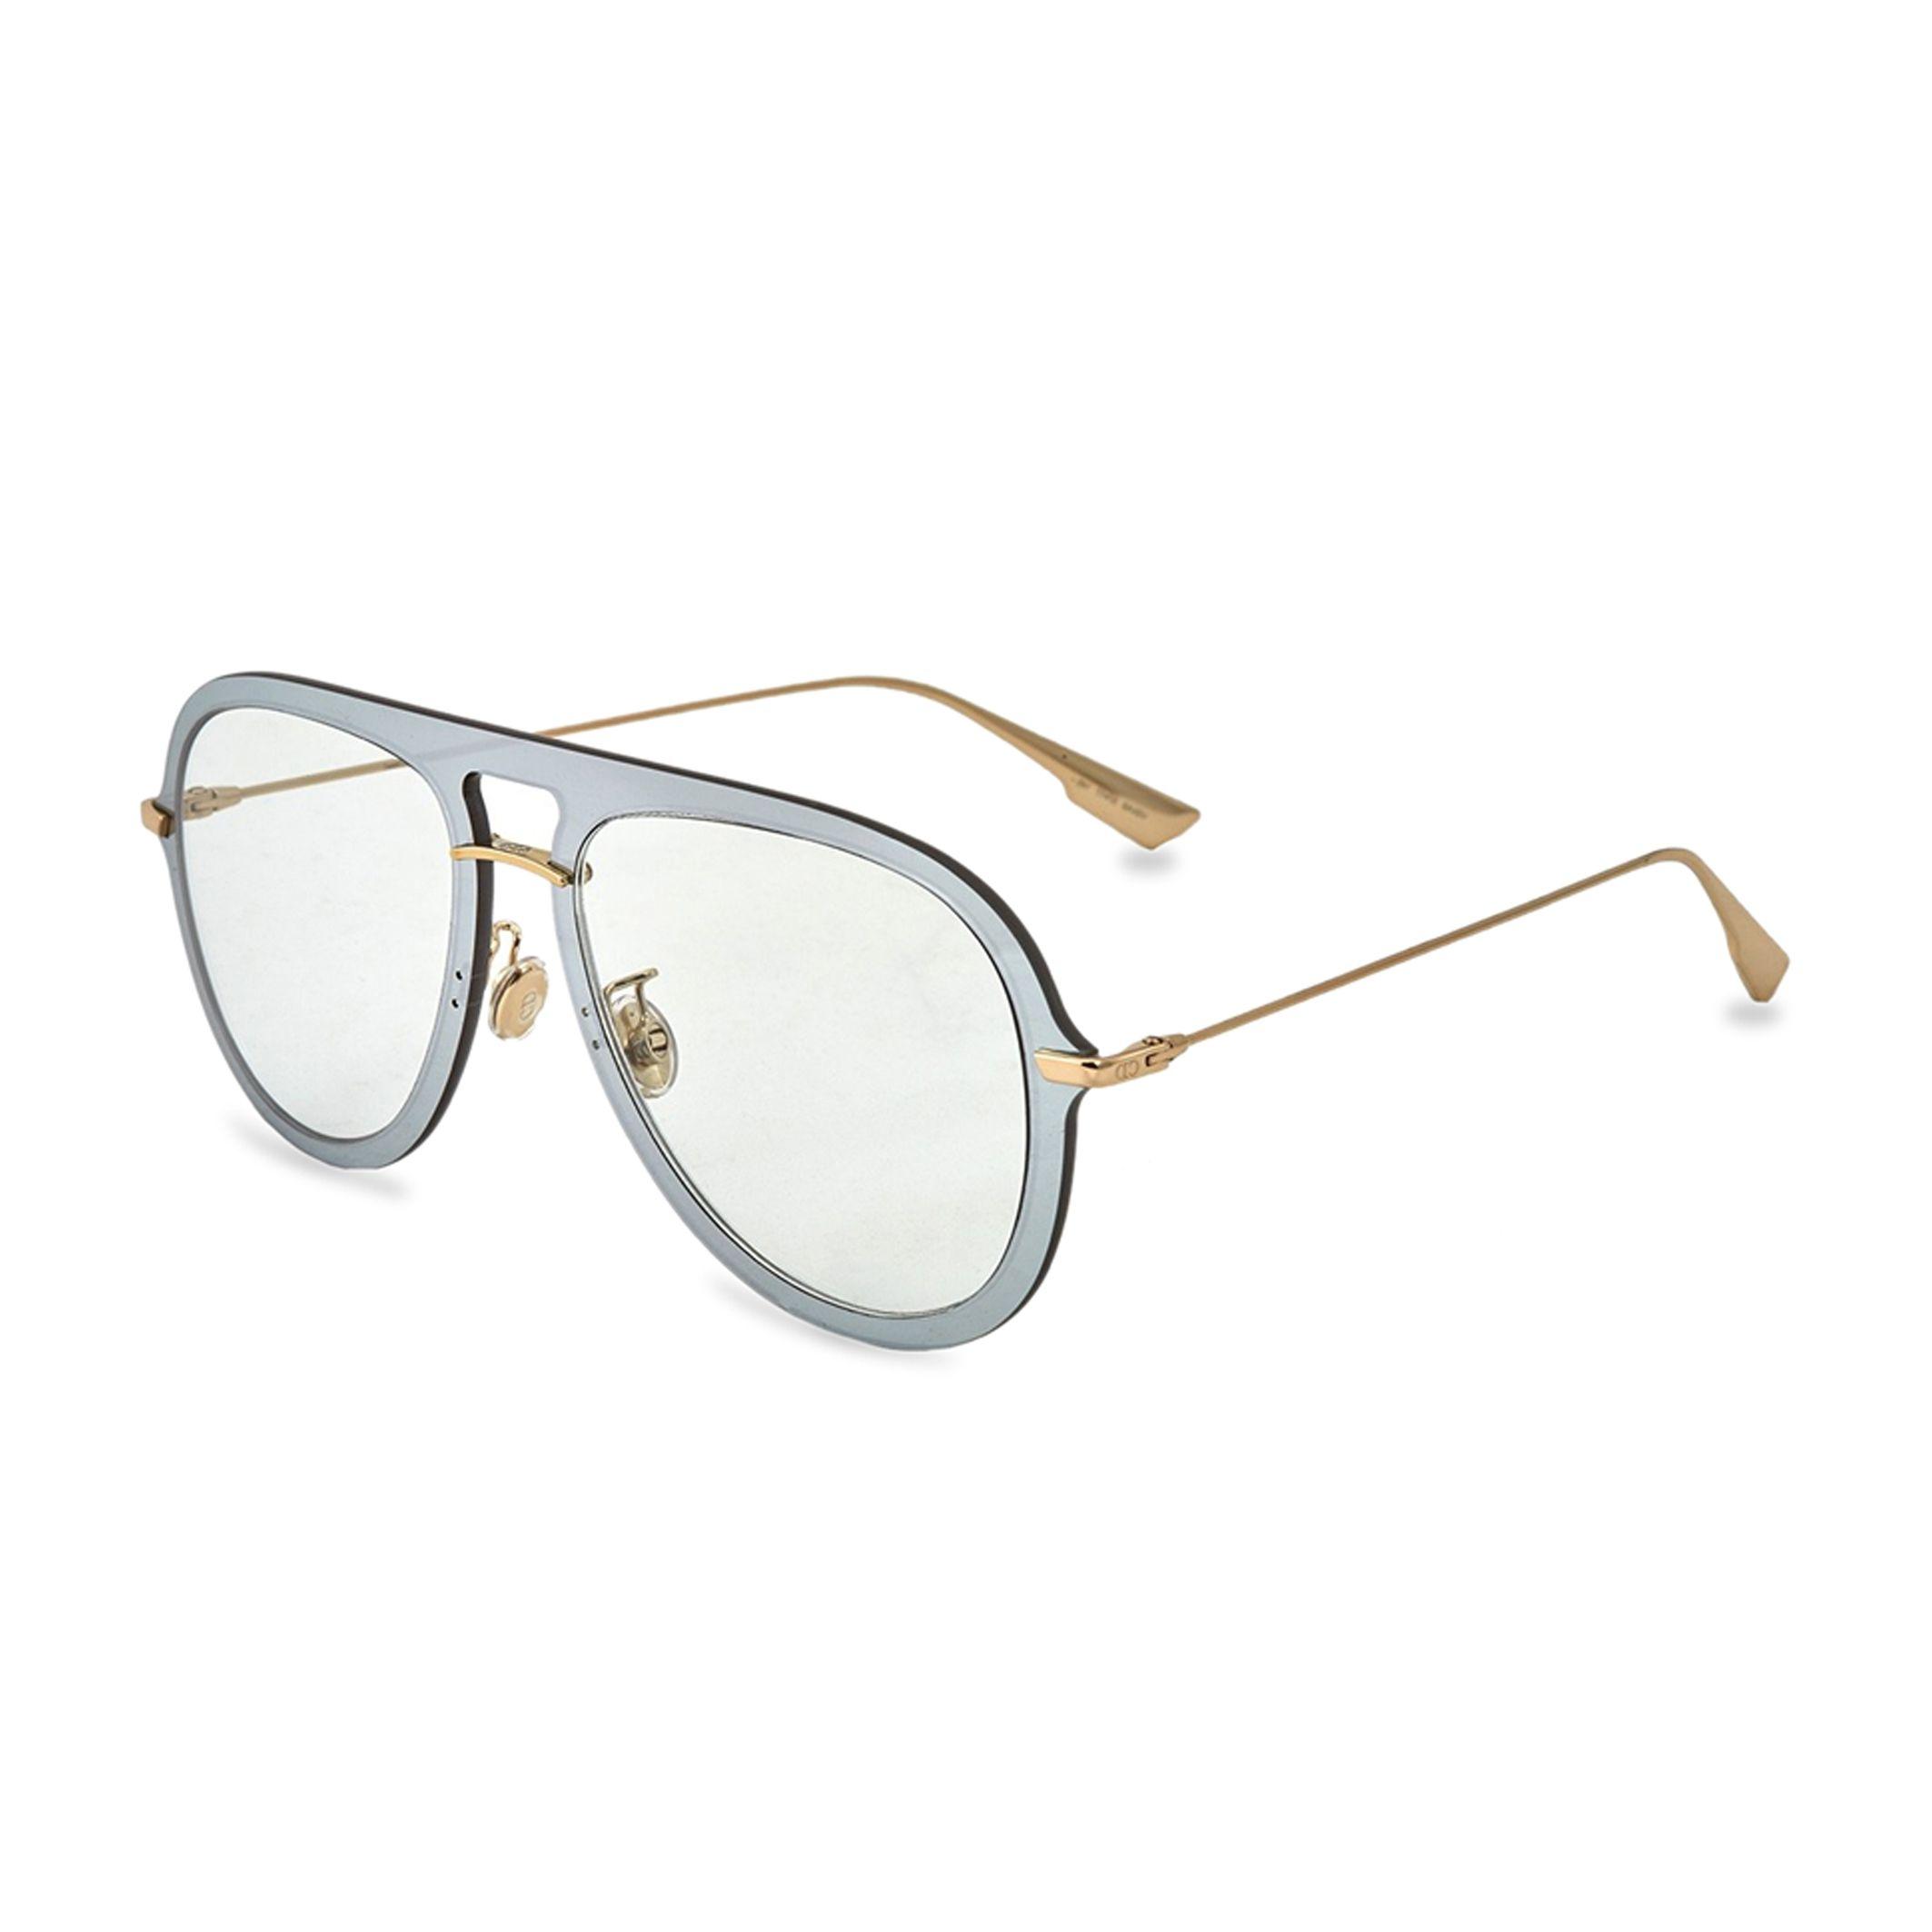 Accessoires Dior – DIORULTIME1 – Grau